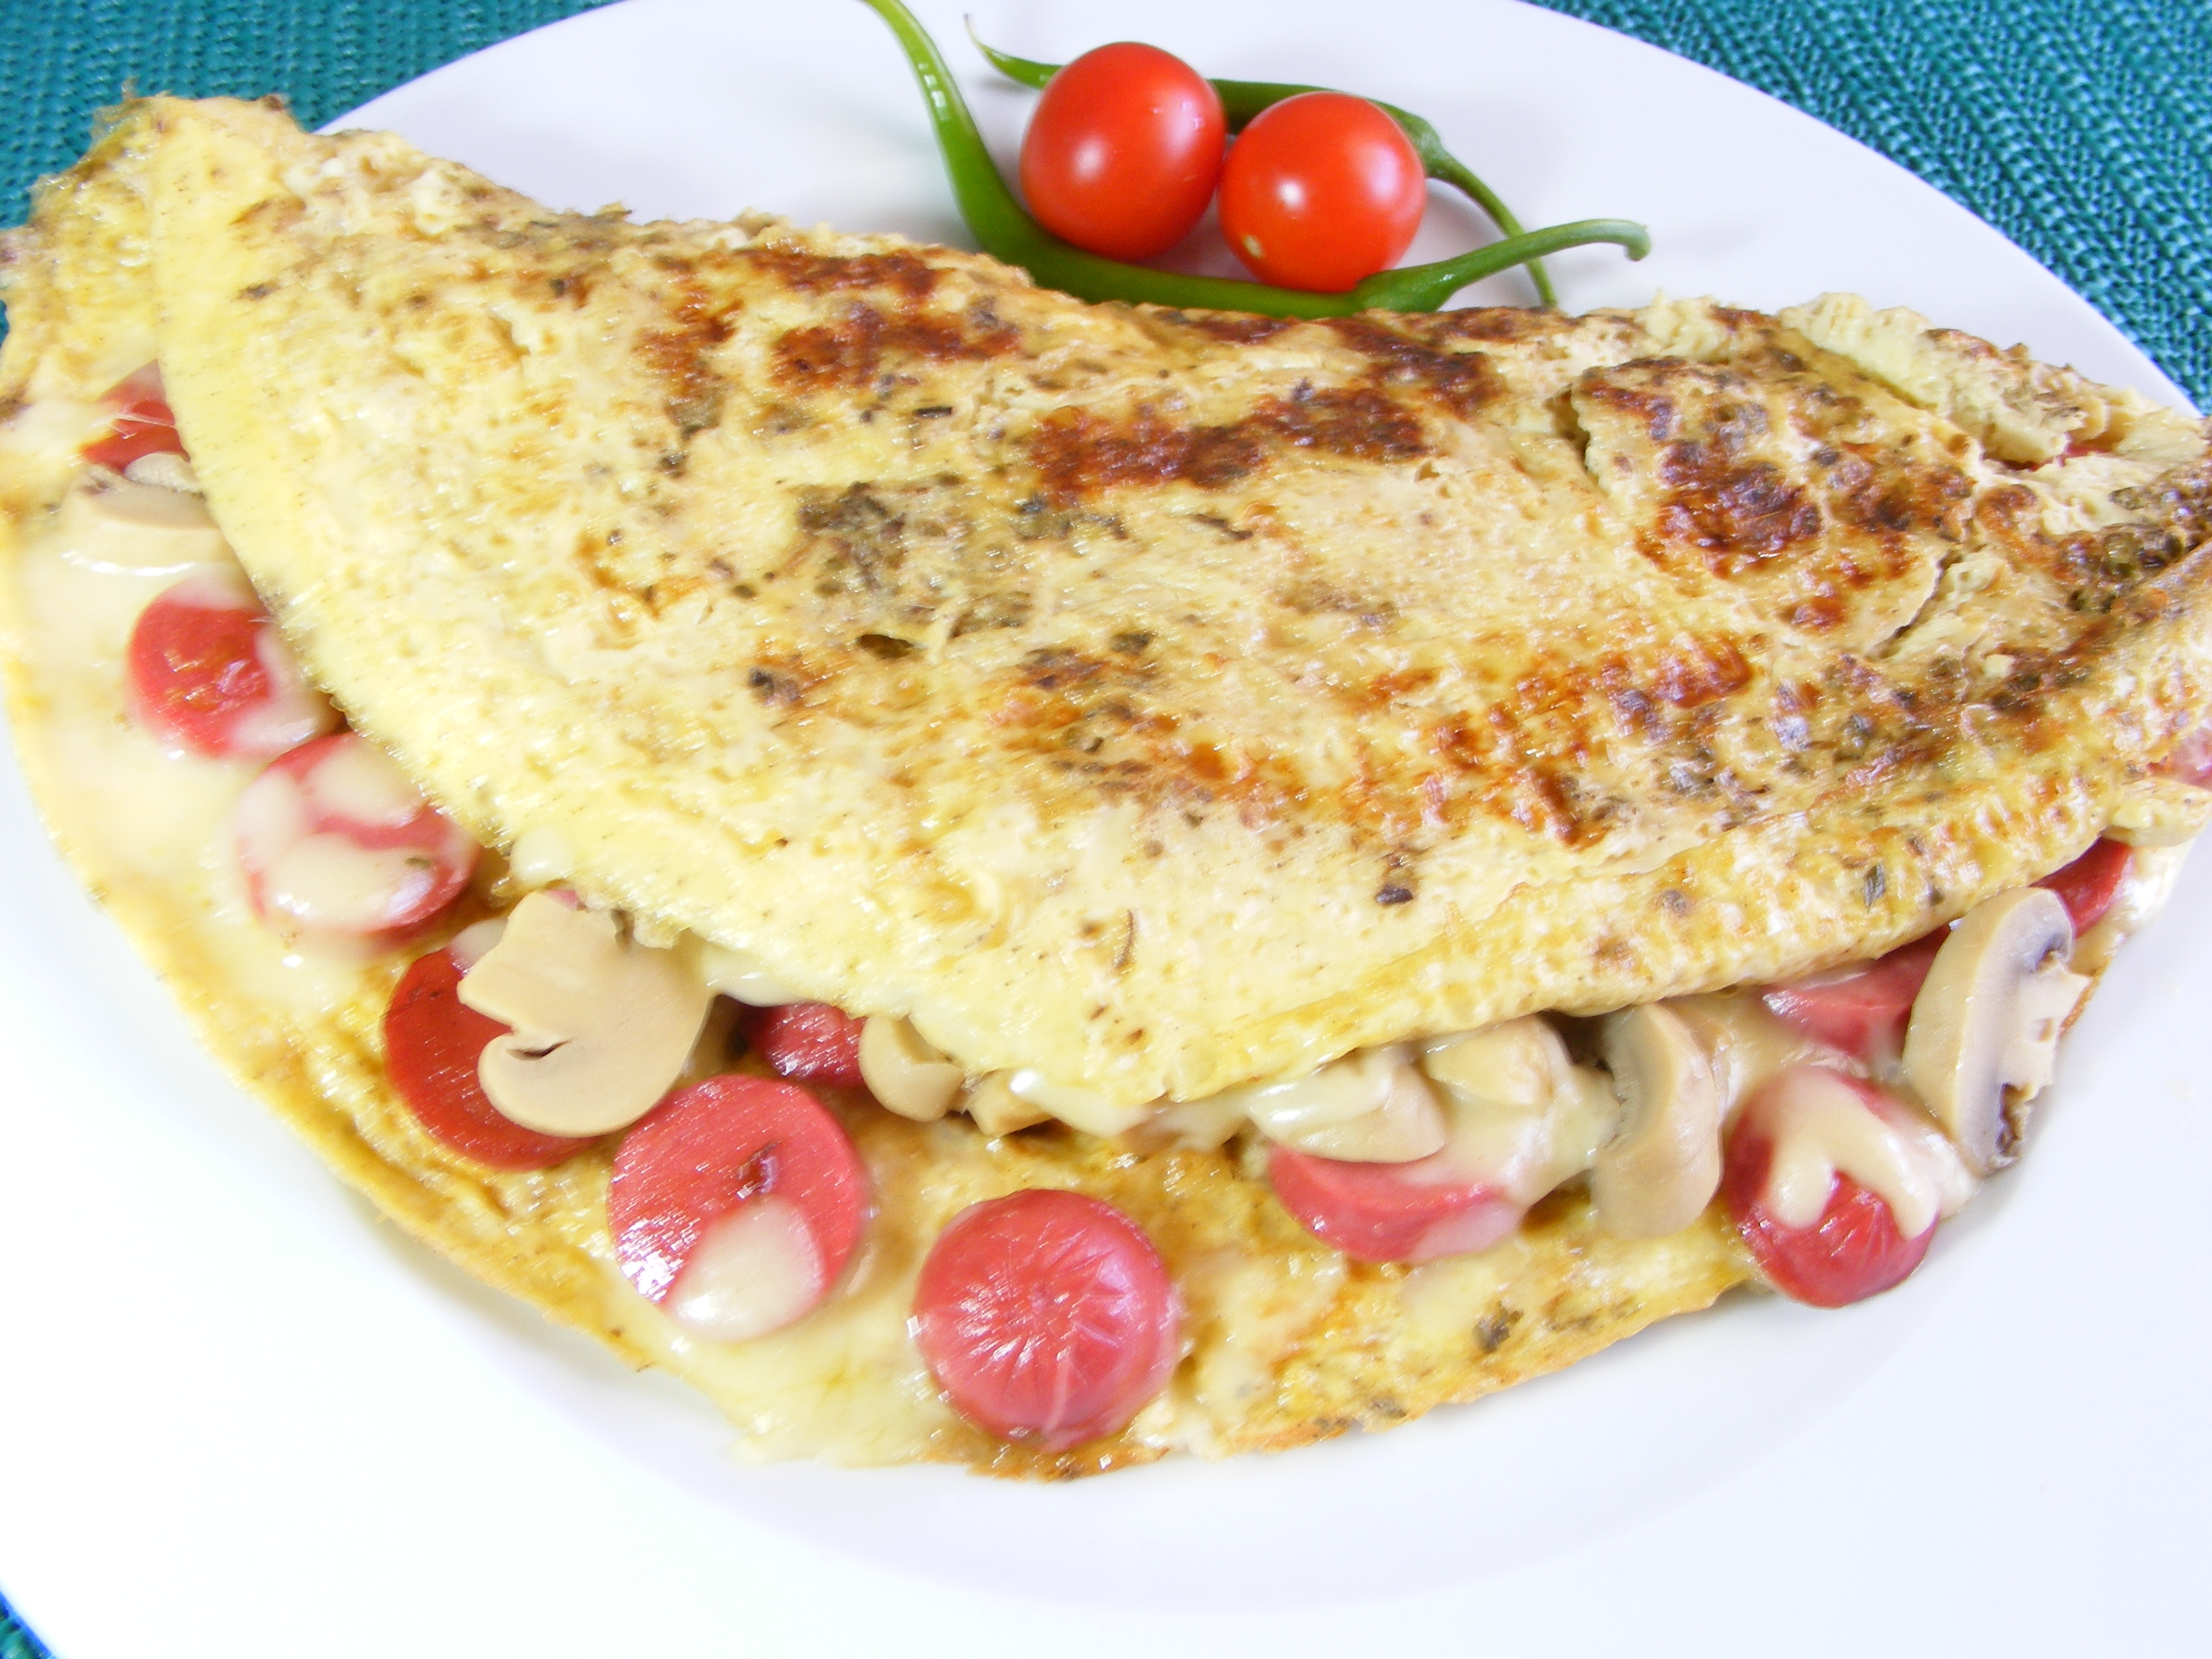 sosisli omlet yemek